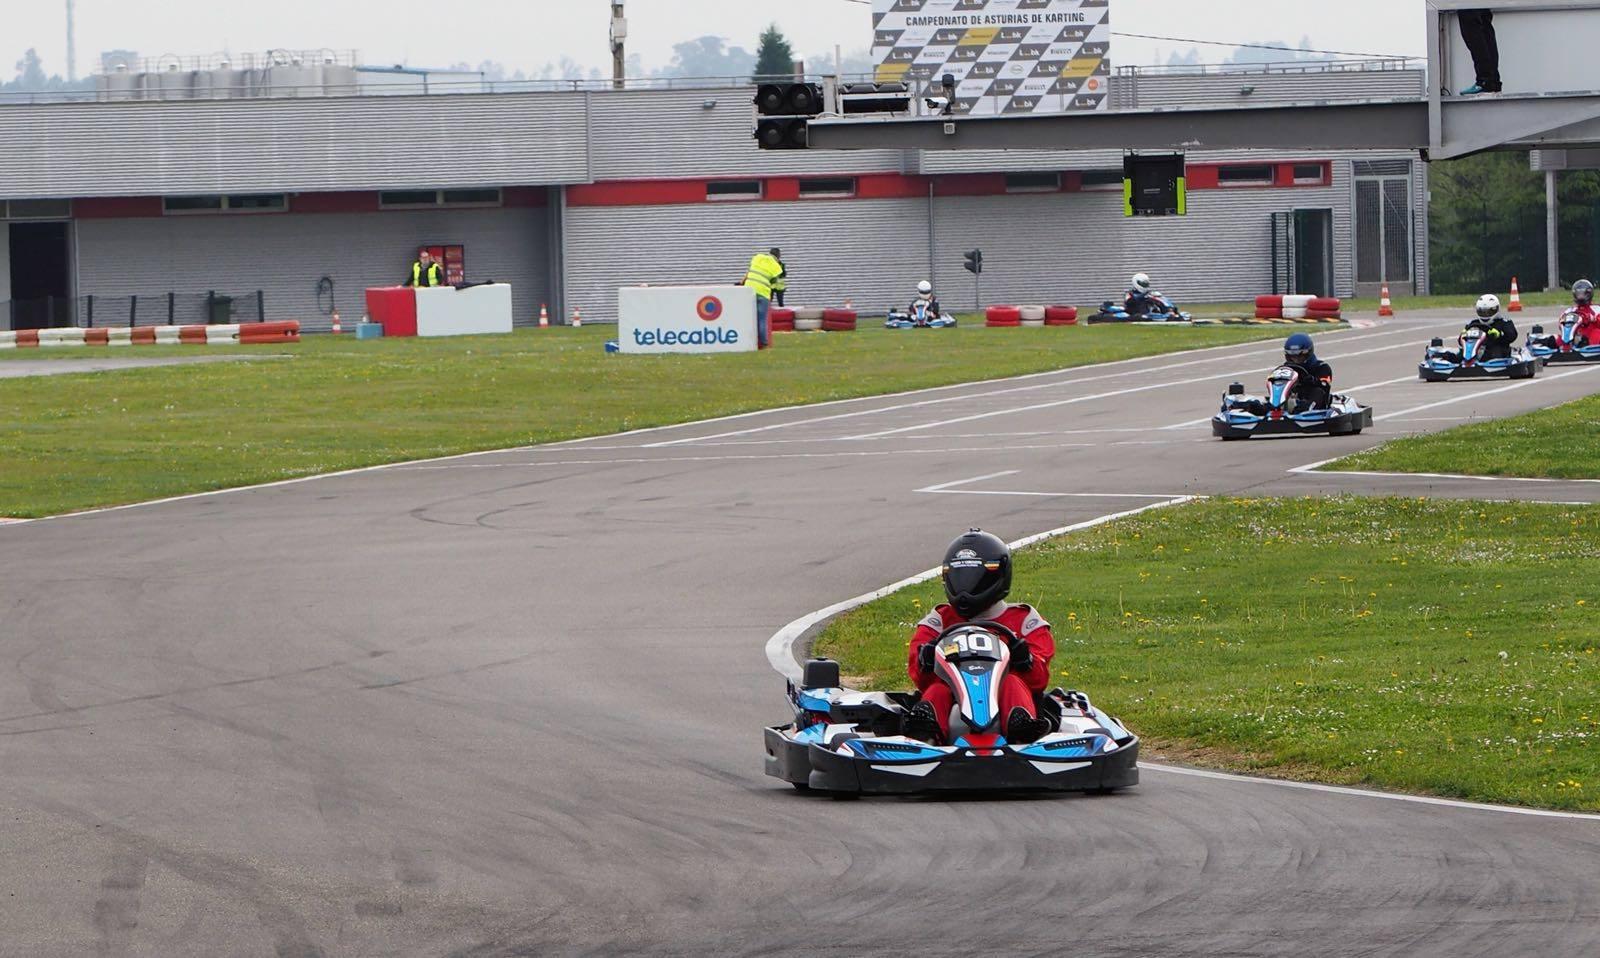 meseta karting Resistencia Fernando Alonso 4